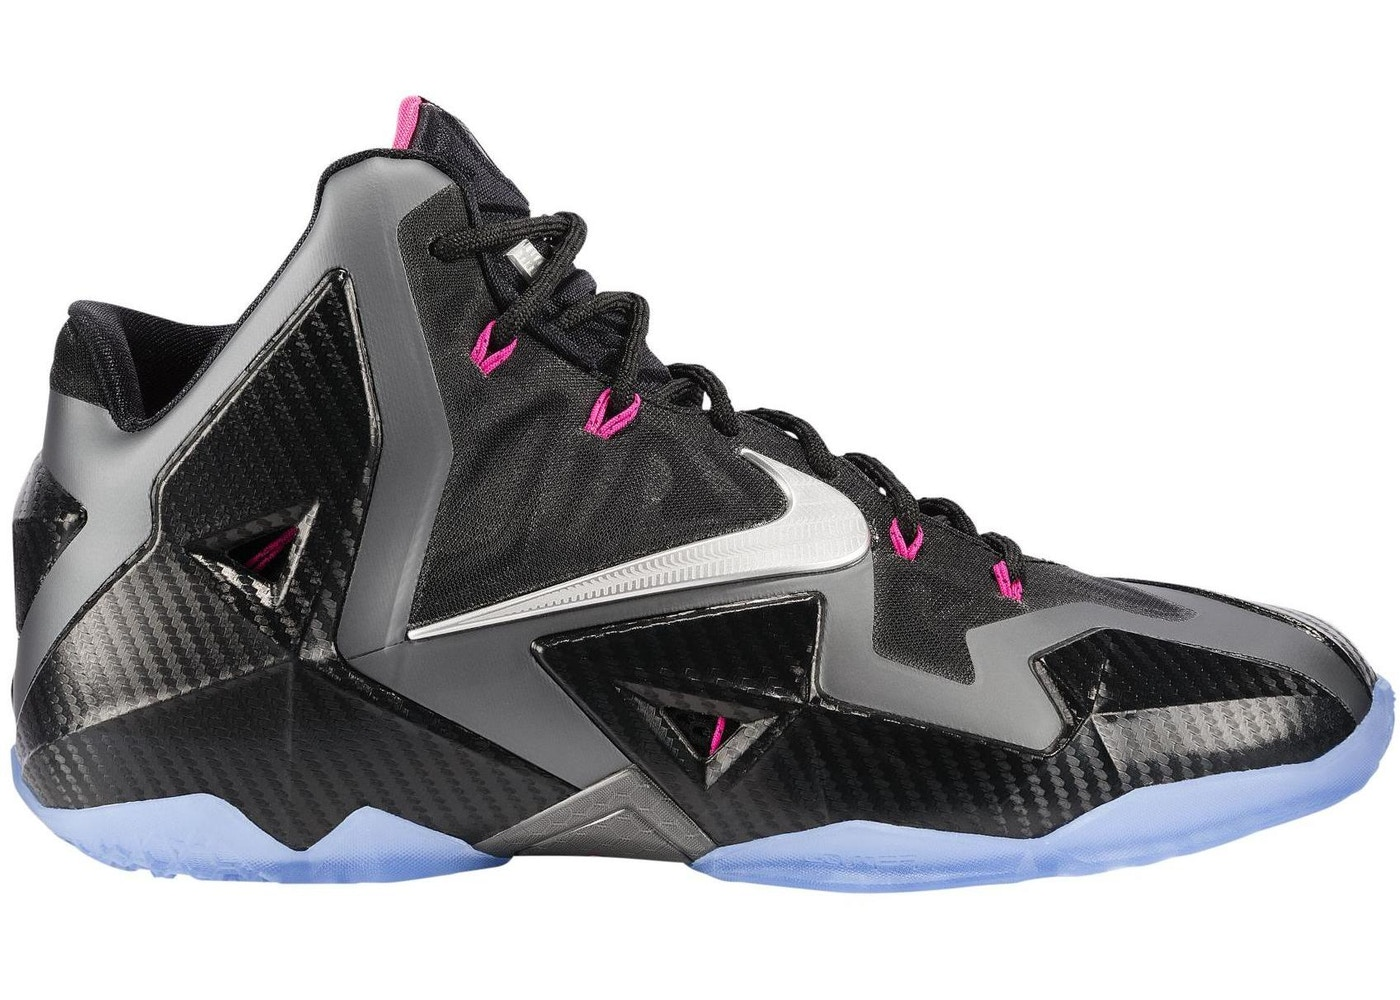 sale retailer d894f d8414 Buy Nike LeBron 11 Shoes   Deadstock Sneakers